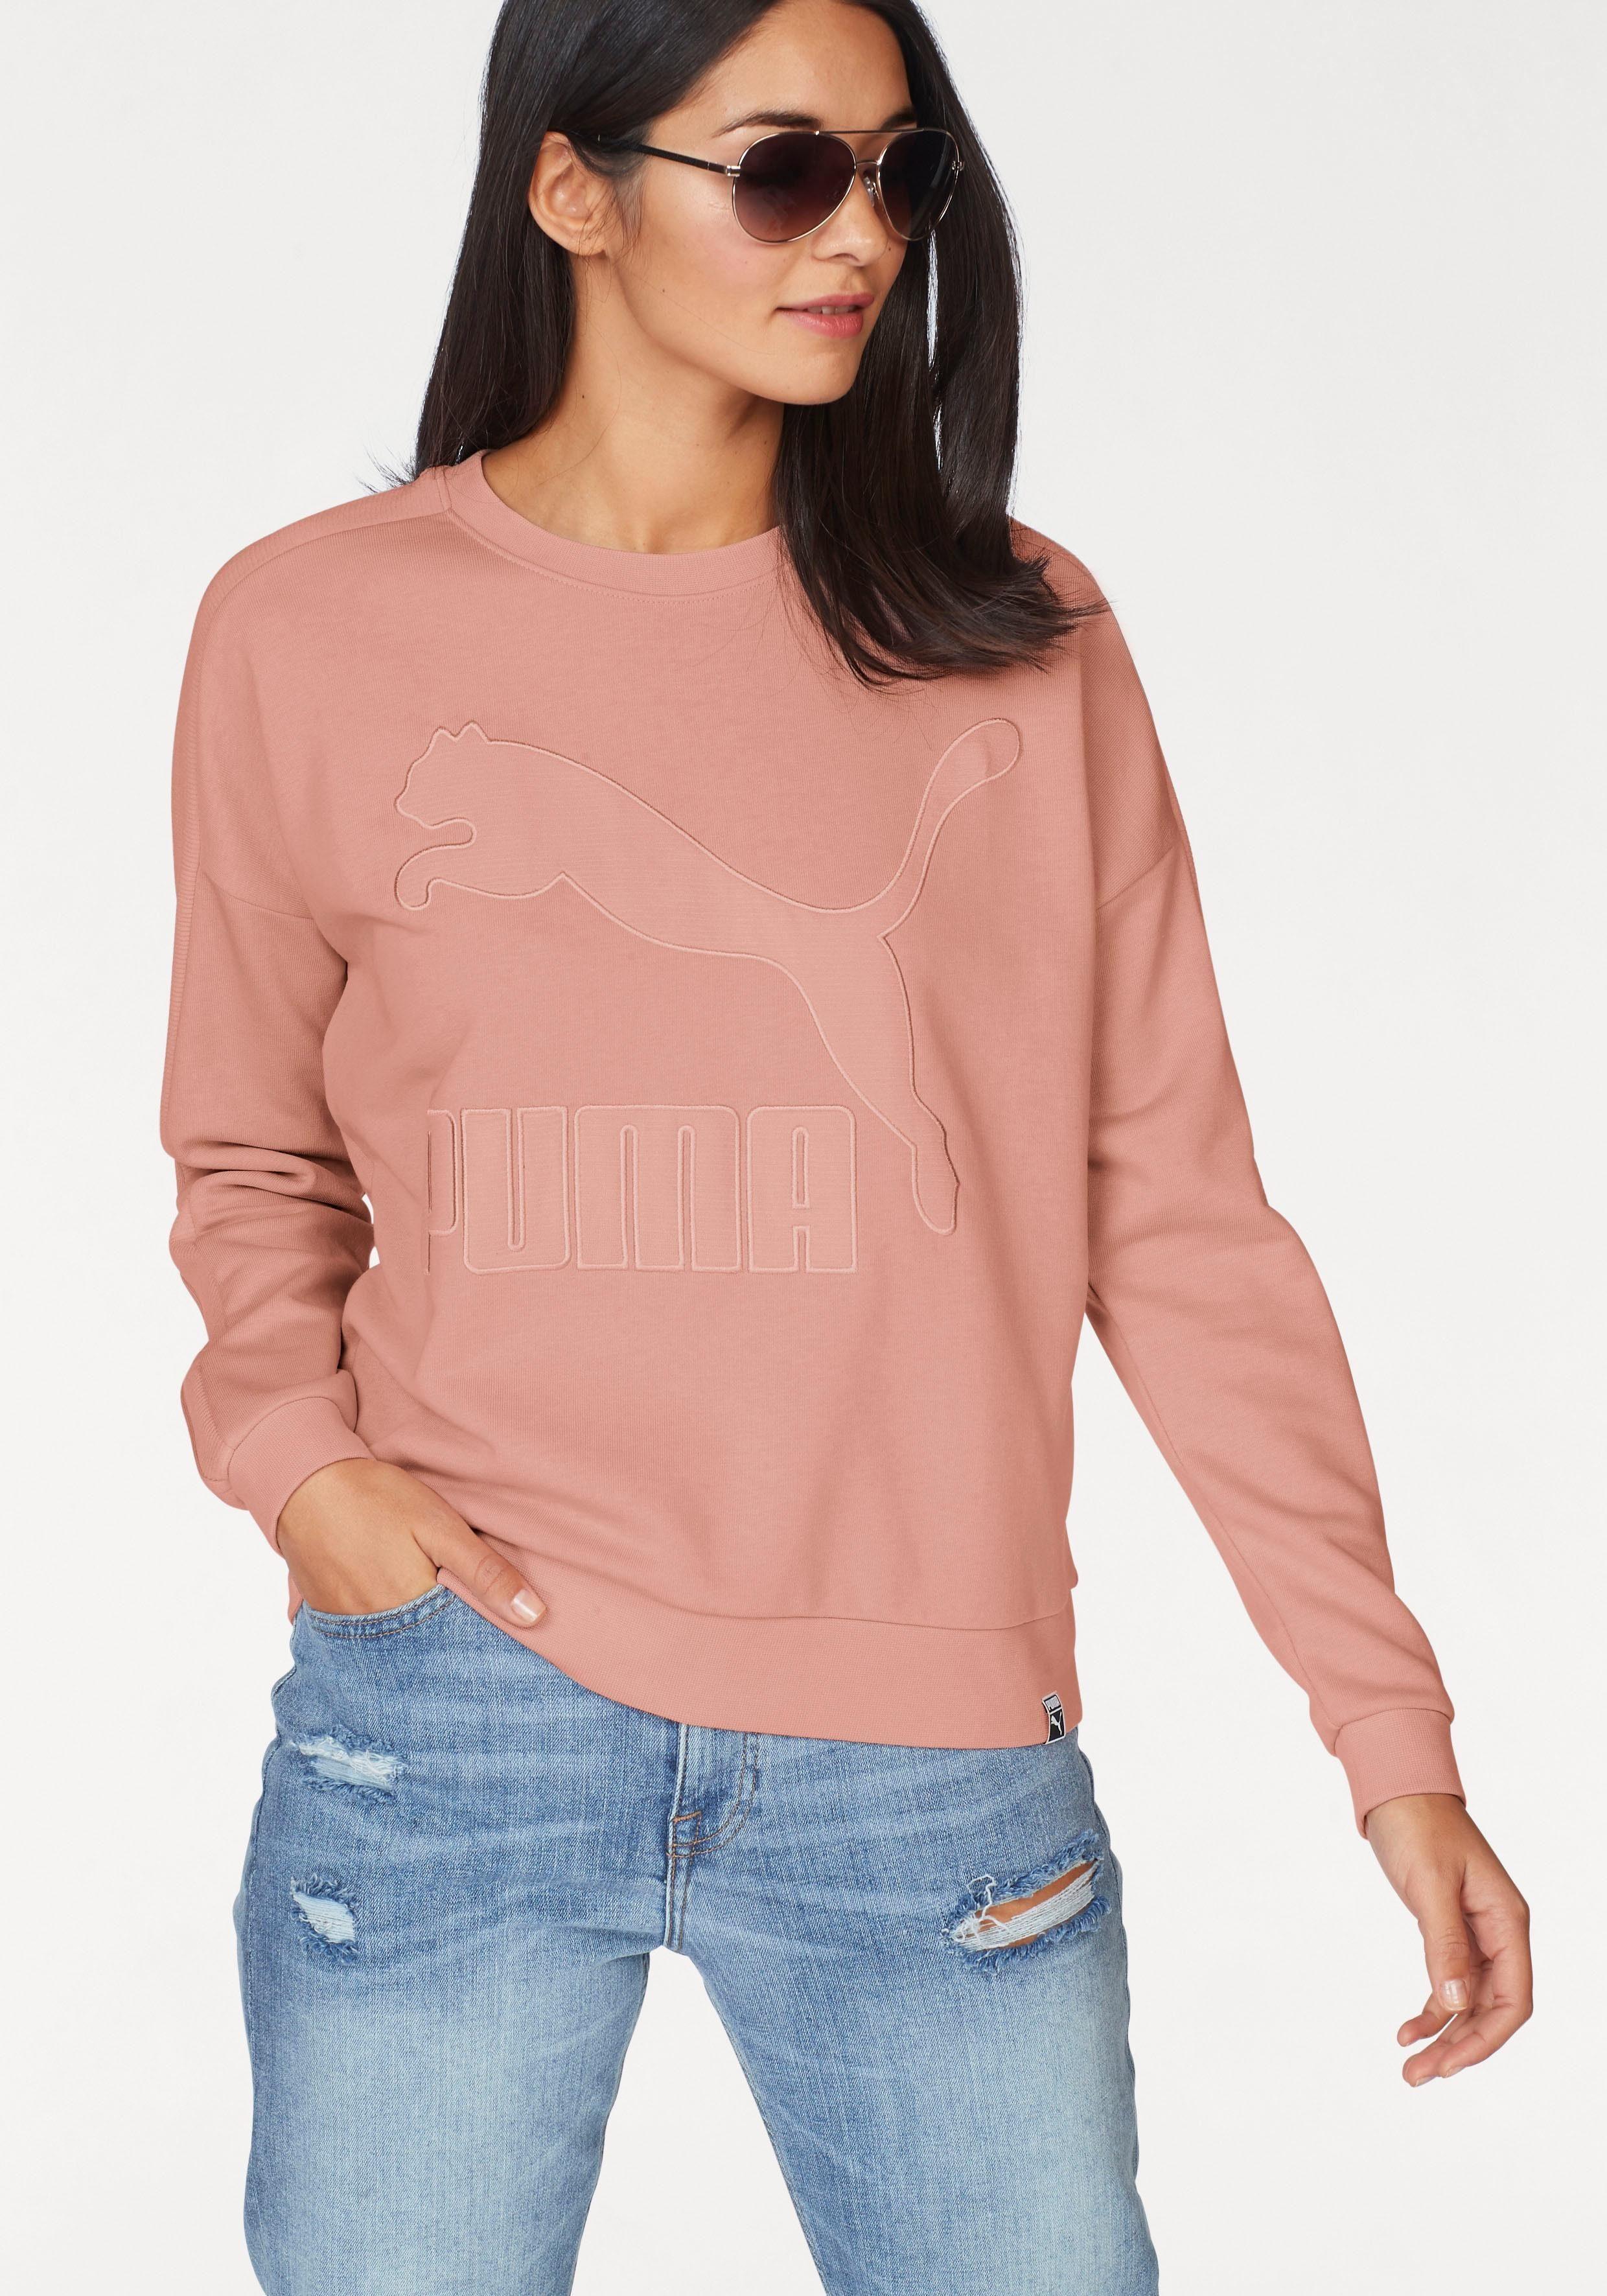 PUMA Sweatshirt »CLASSICS STRUCTURED T7 CREW«